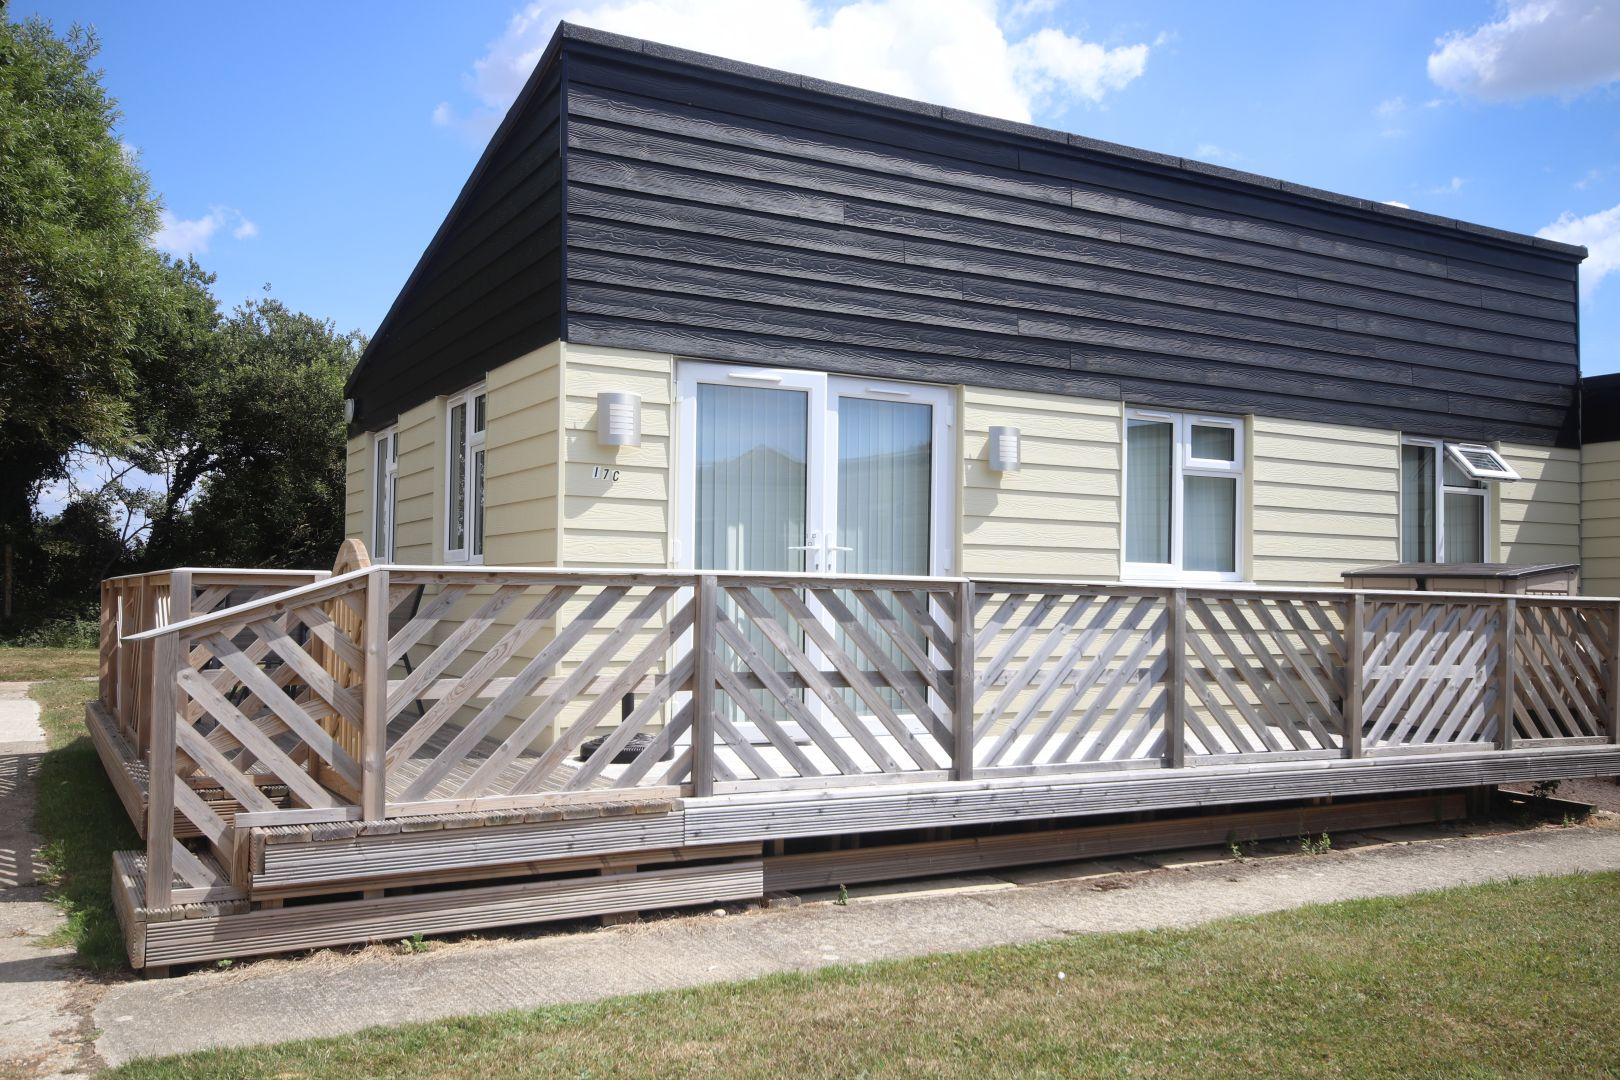 17C Medmerry Park 2 Bedroom Chalet